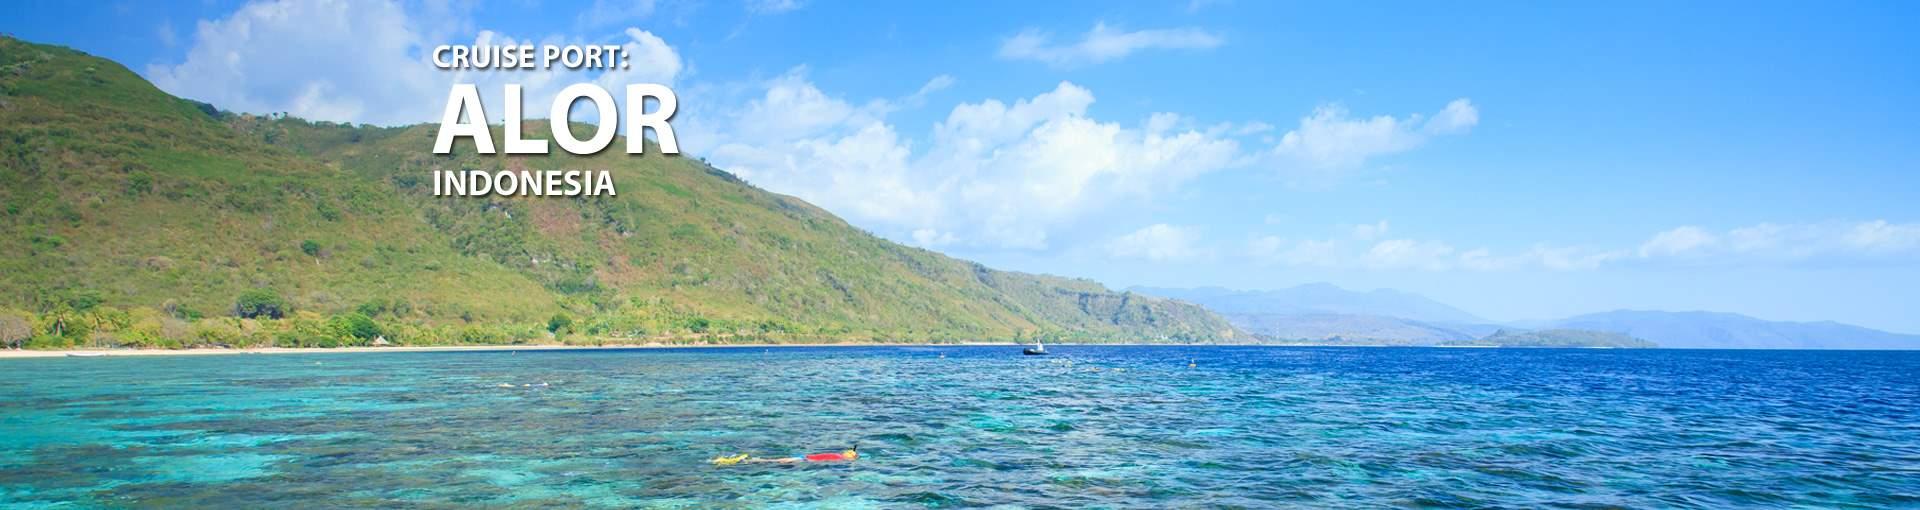 Cruises to Alor, Indonesia